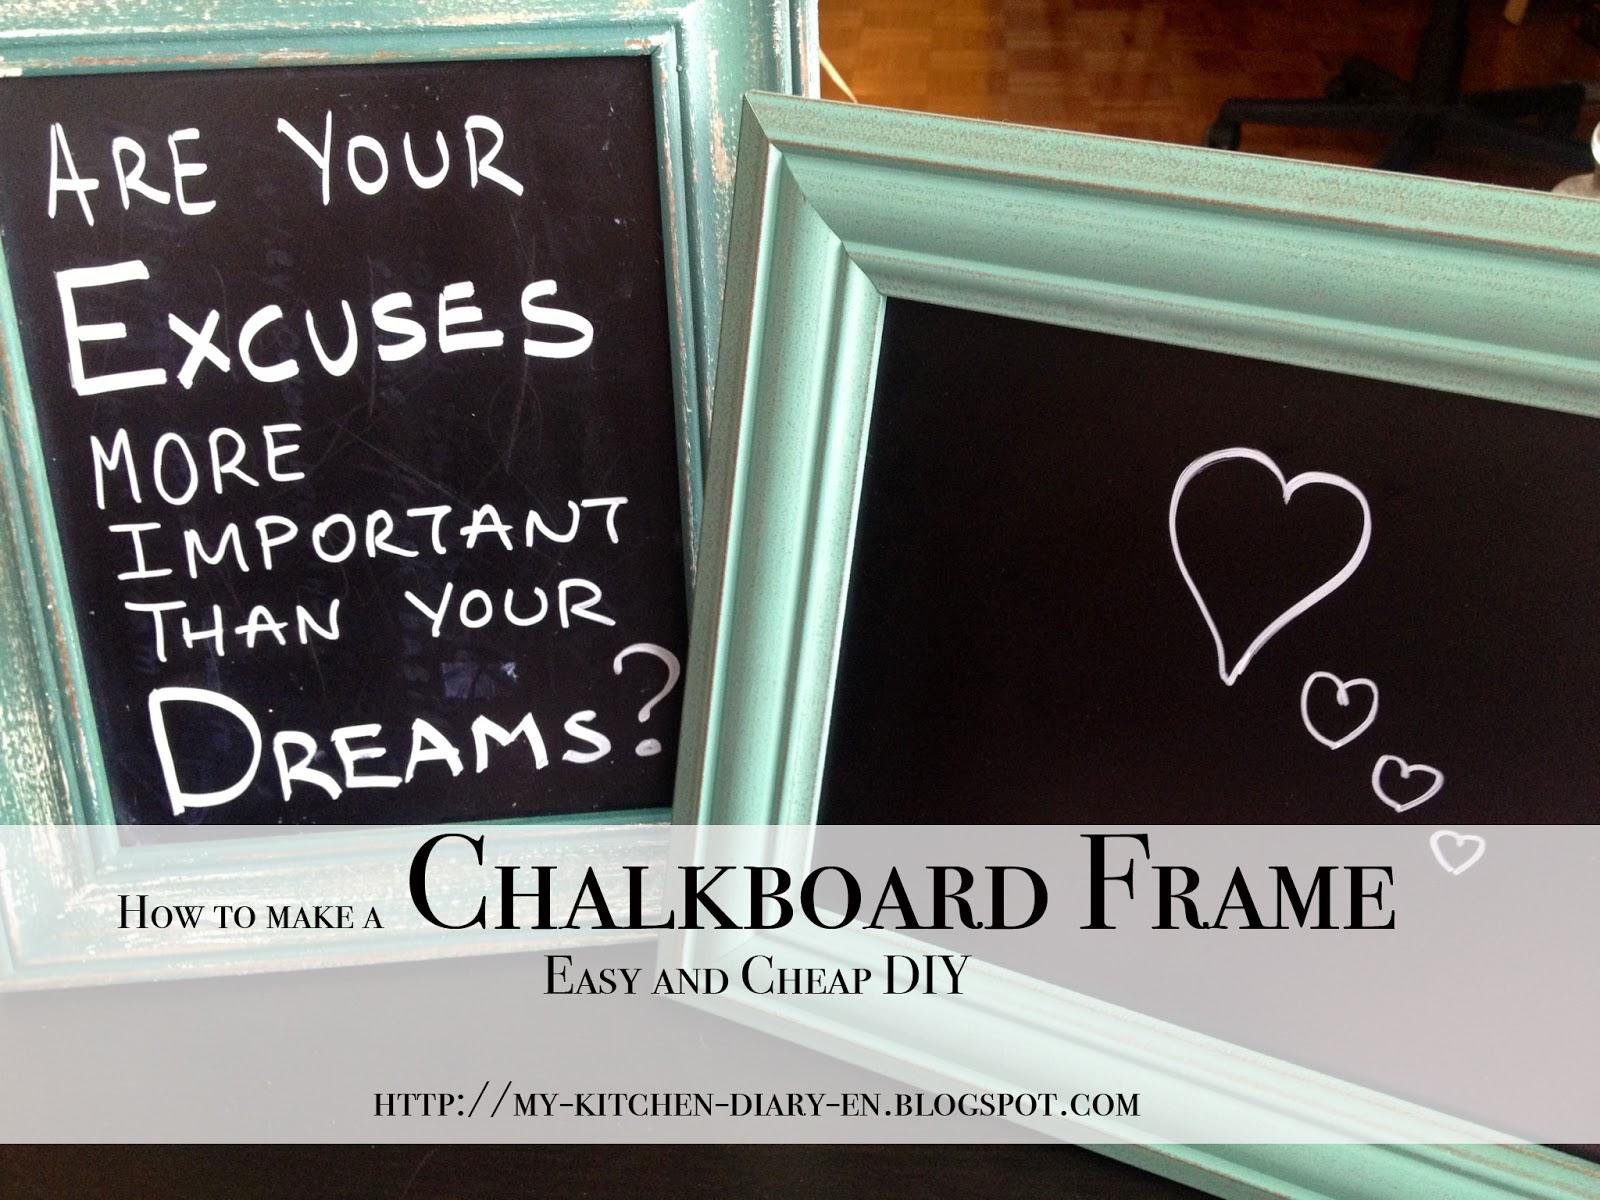 My Kitchen Diary: Chalkboard Frame (DIY)